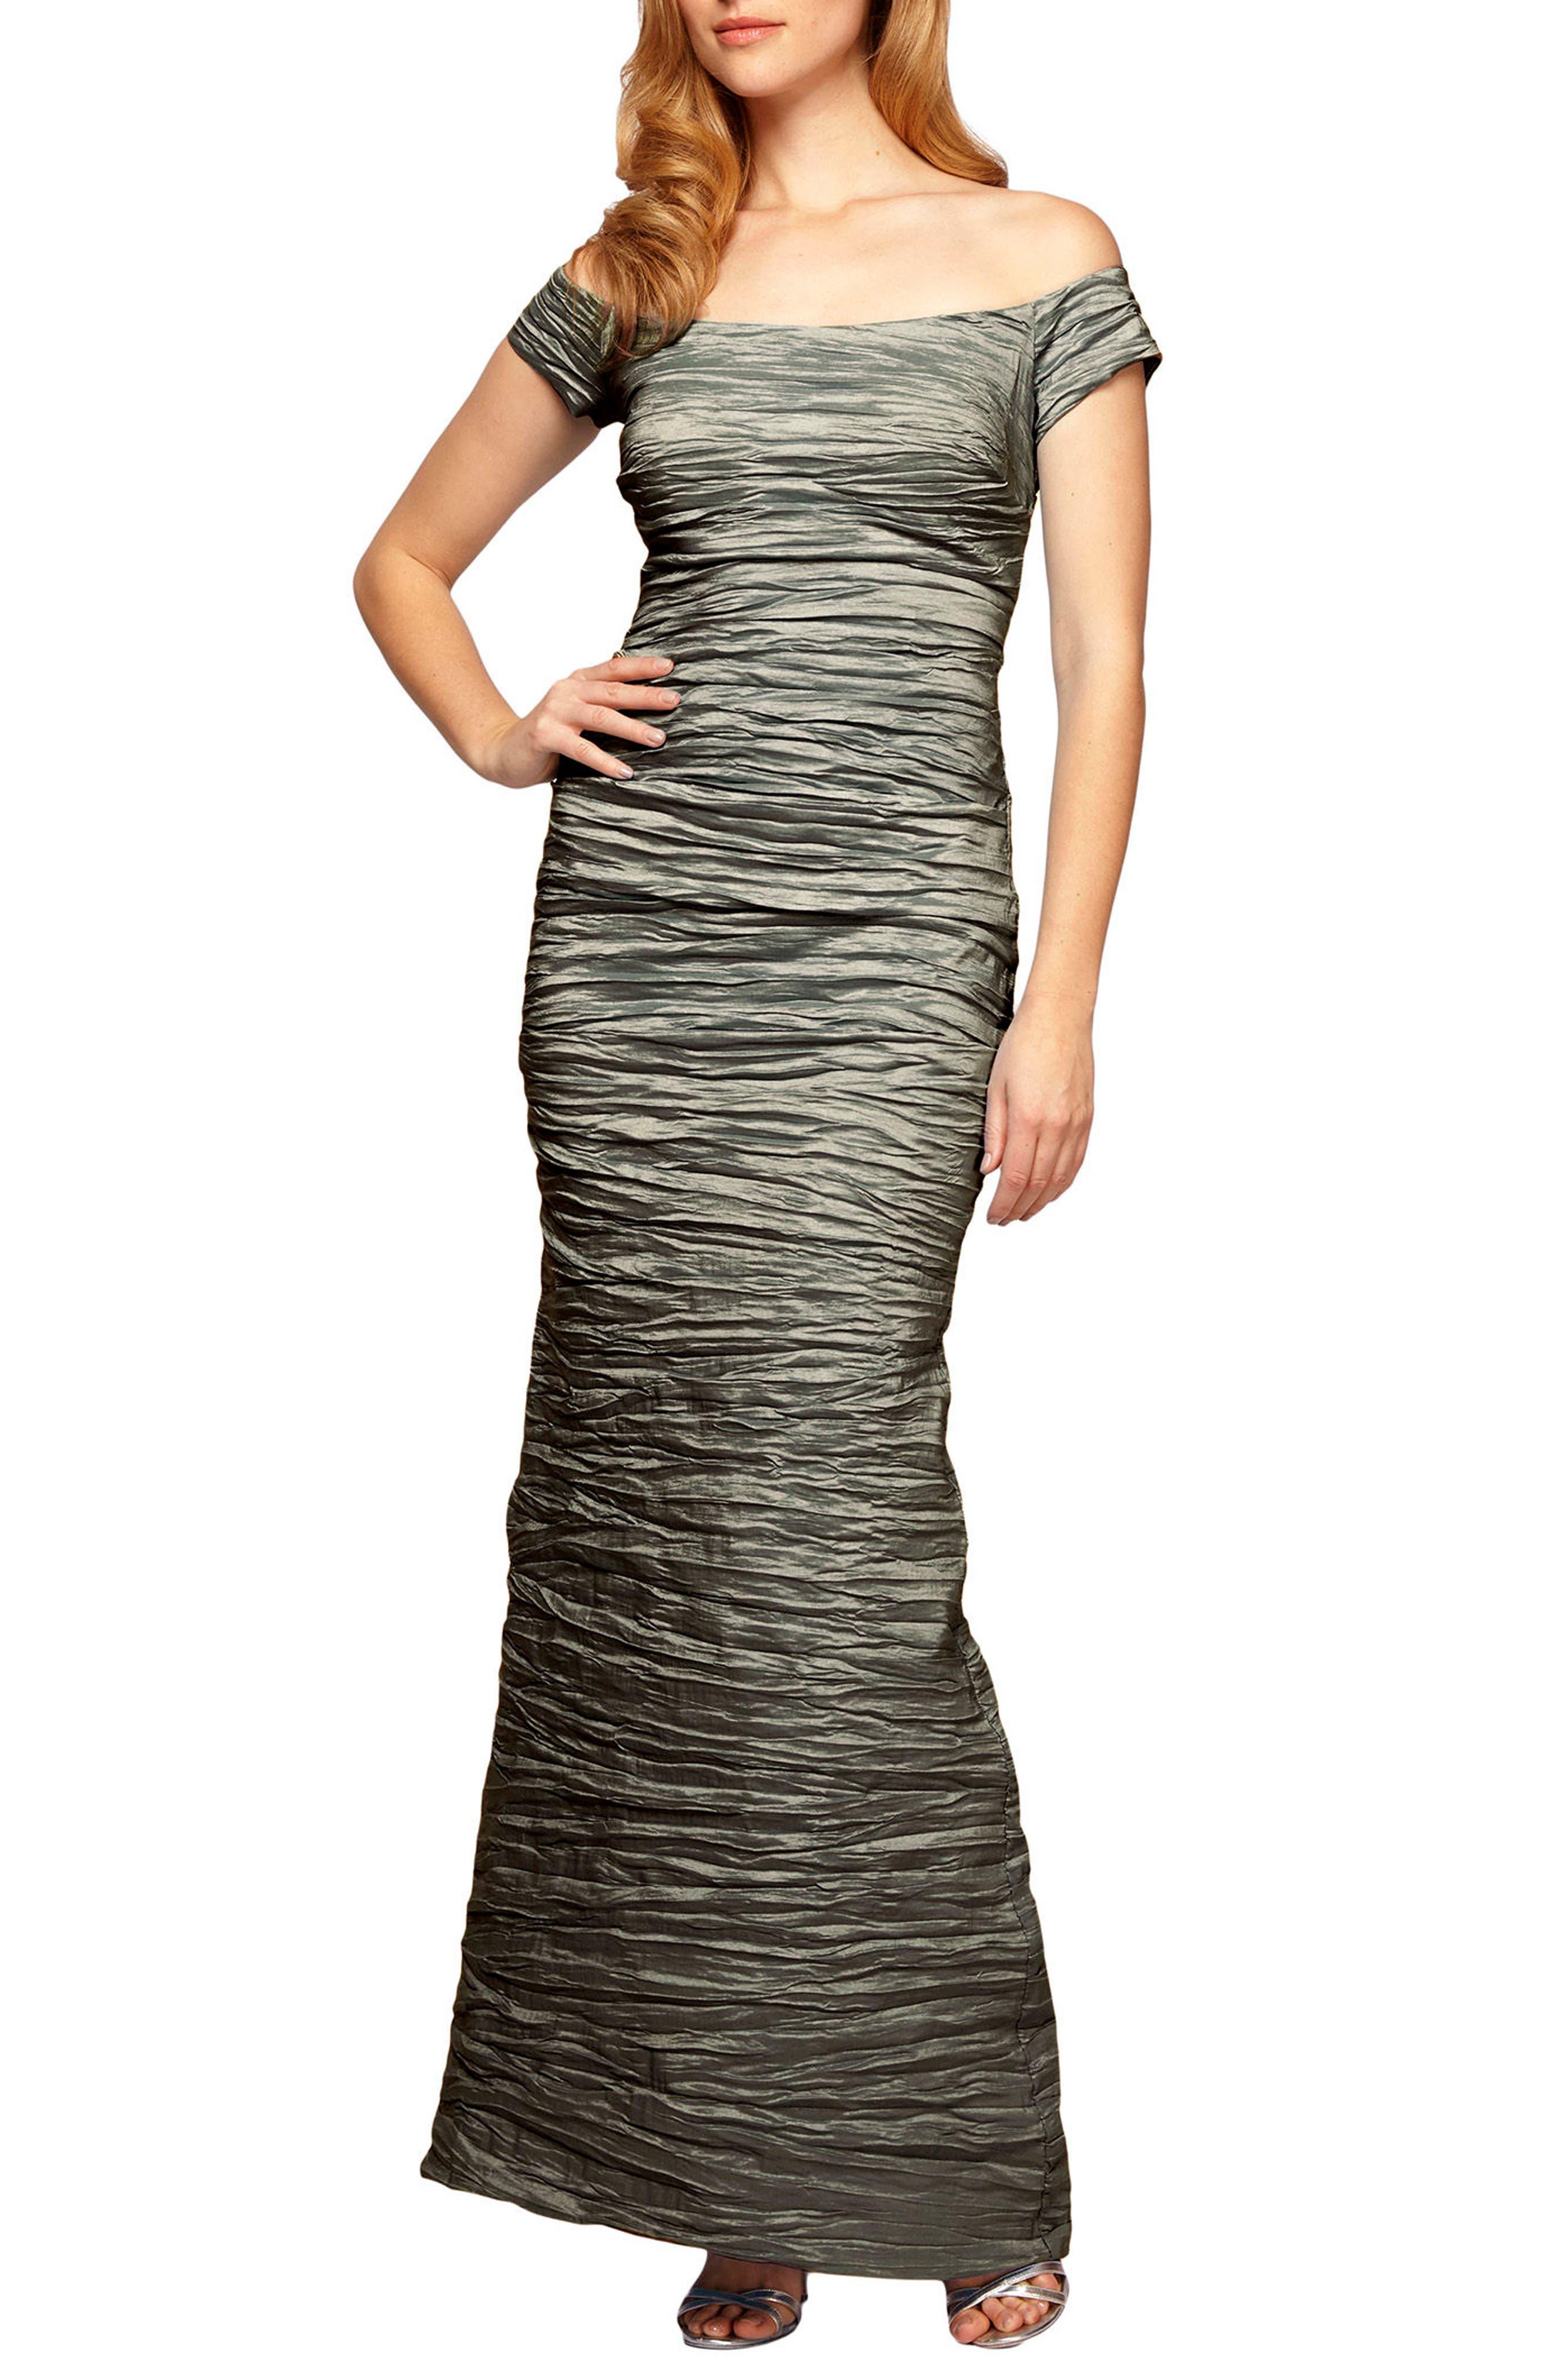 Alternate Image 1 Selected - Alex Evenings Taffeta Mermaid Gown